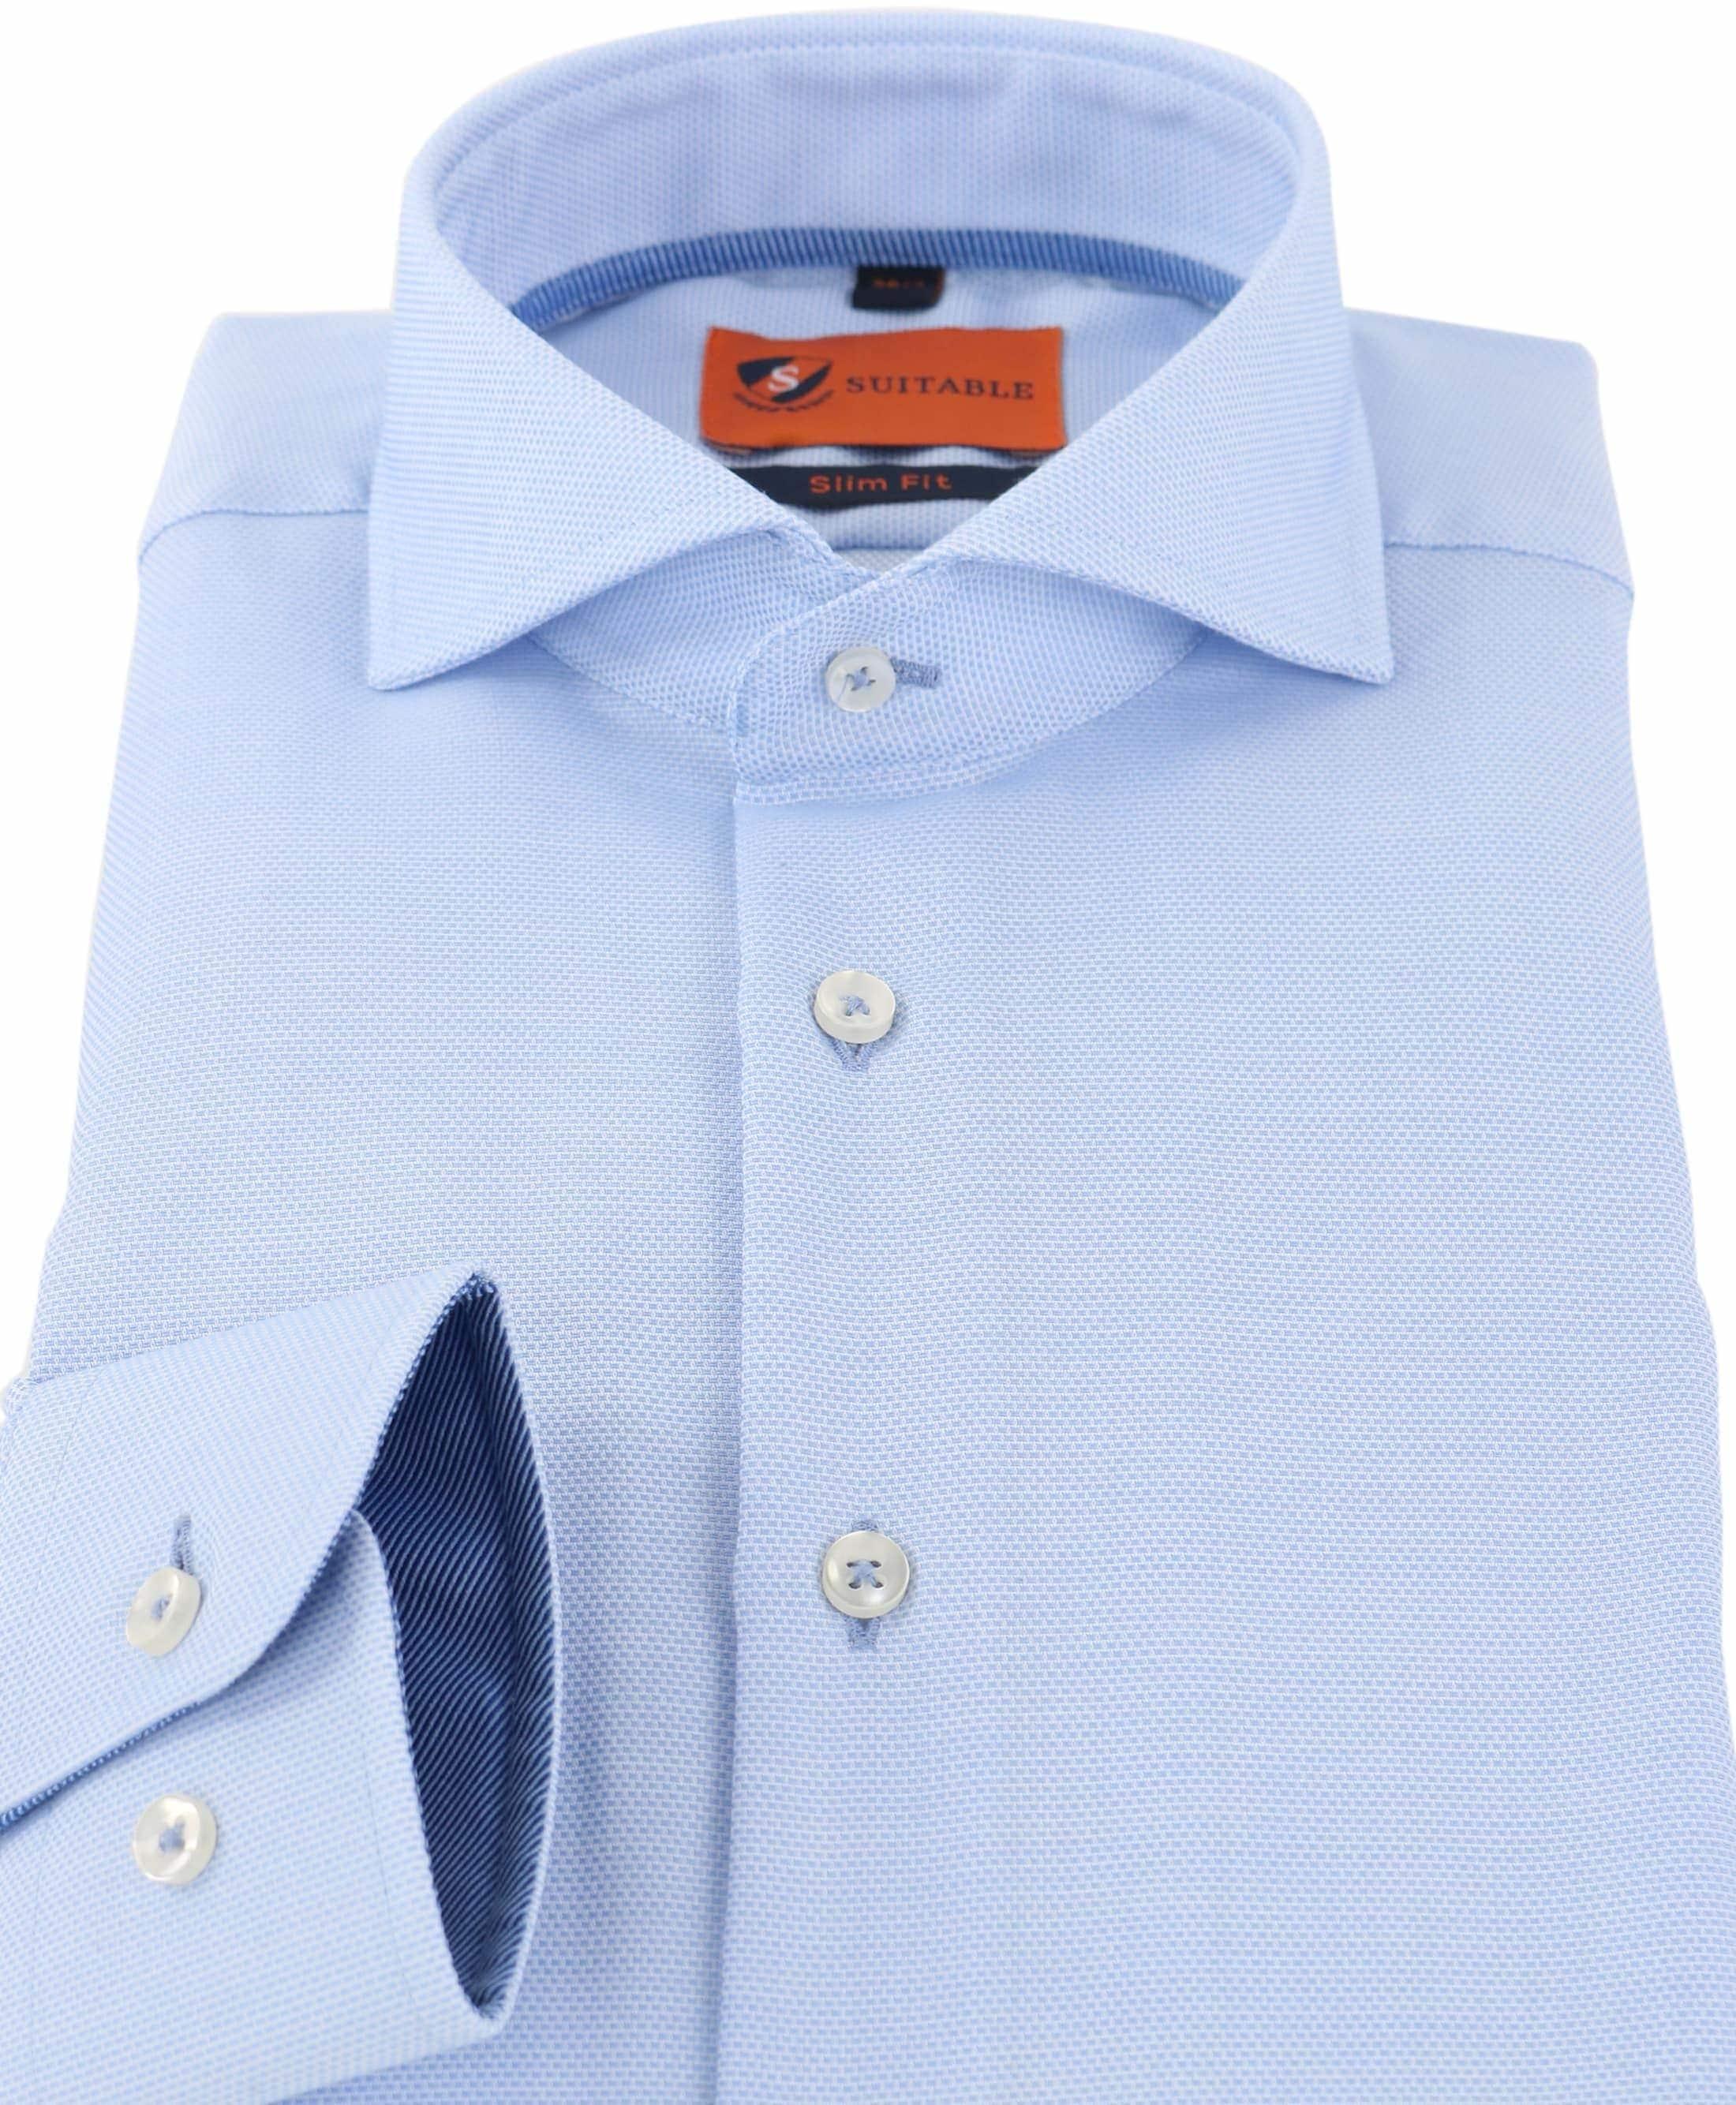 Mouwlengte 7 Overhemd Blauw 150-4 foto 1